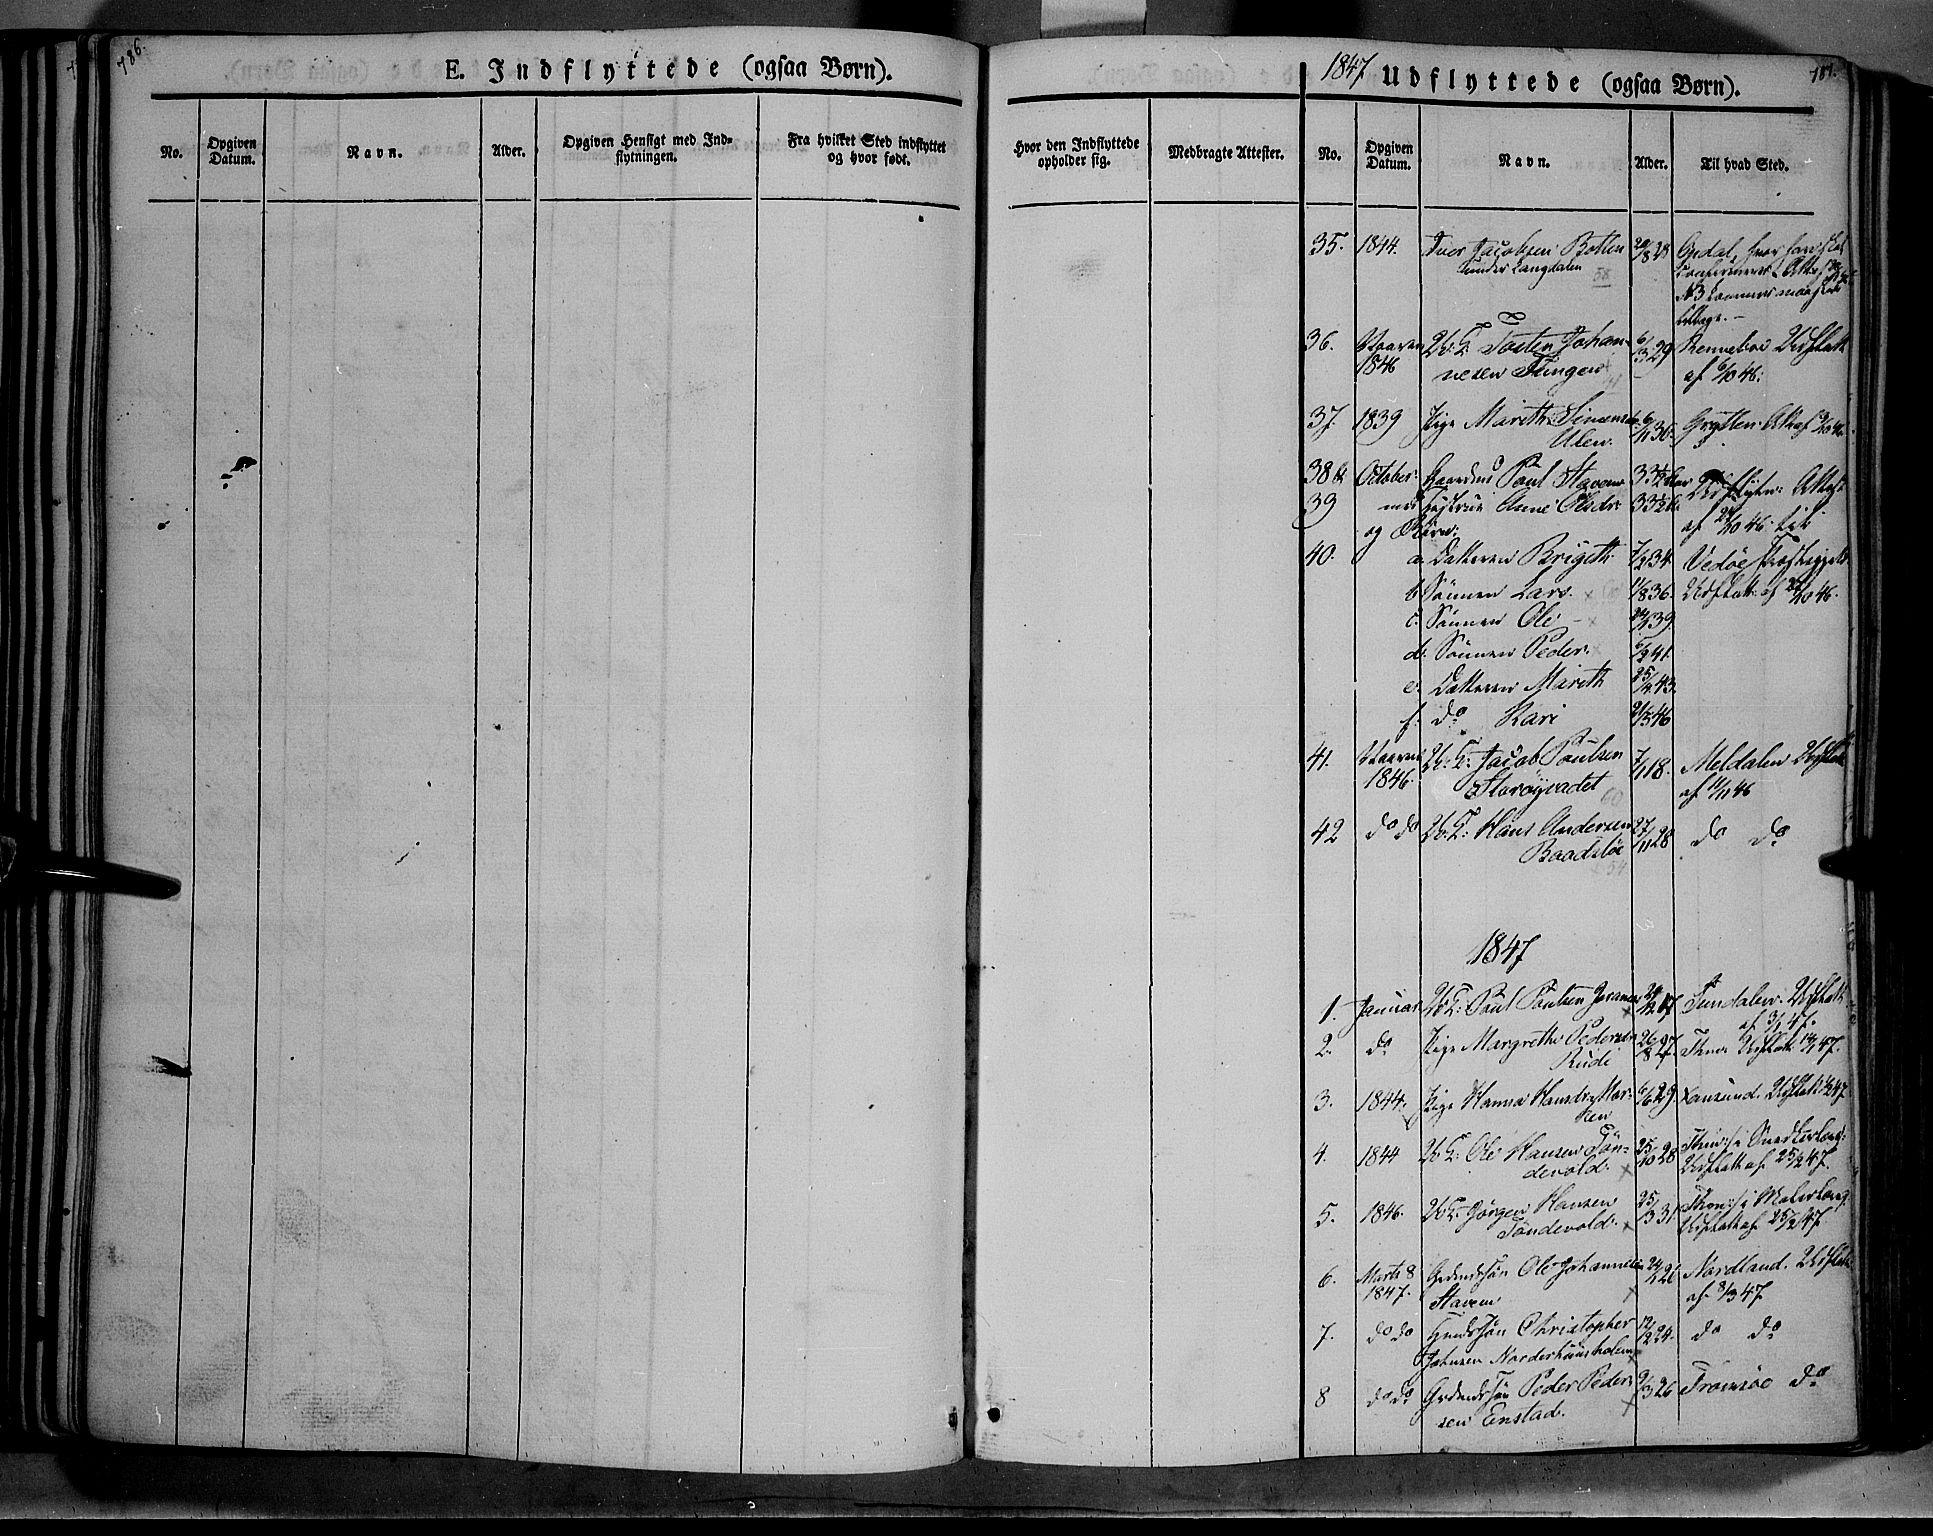 SAH, Lesja prestekontor, Ministerialbok nr. 6B, 1843-1854, s. 786-787